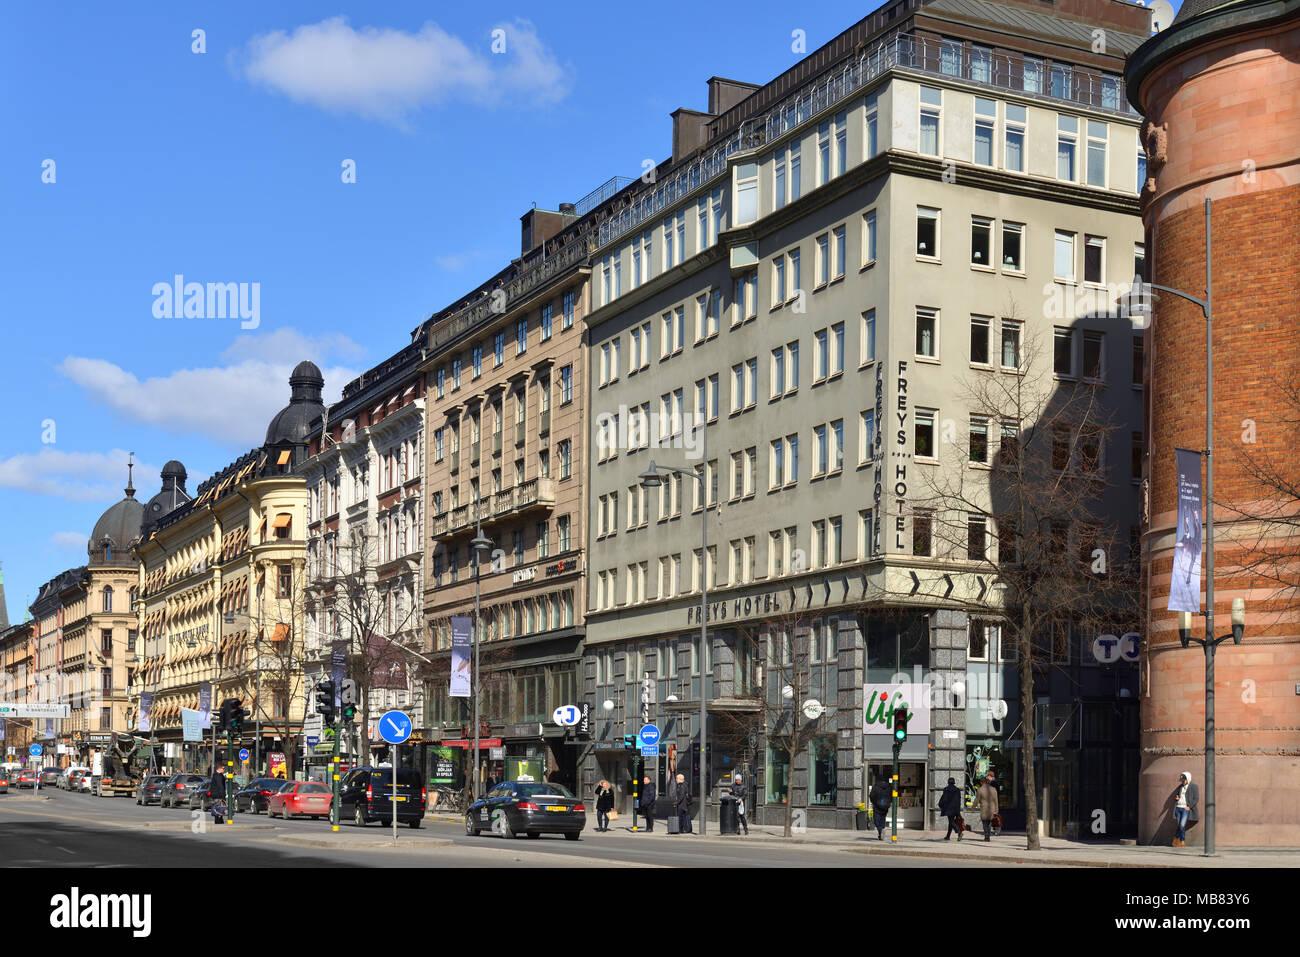 Vasagatan, major street in central Stockholm named after King Gustav Vasa Stock Photo